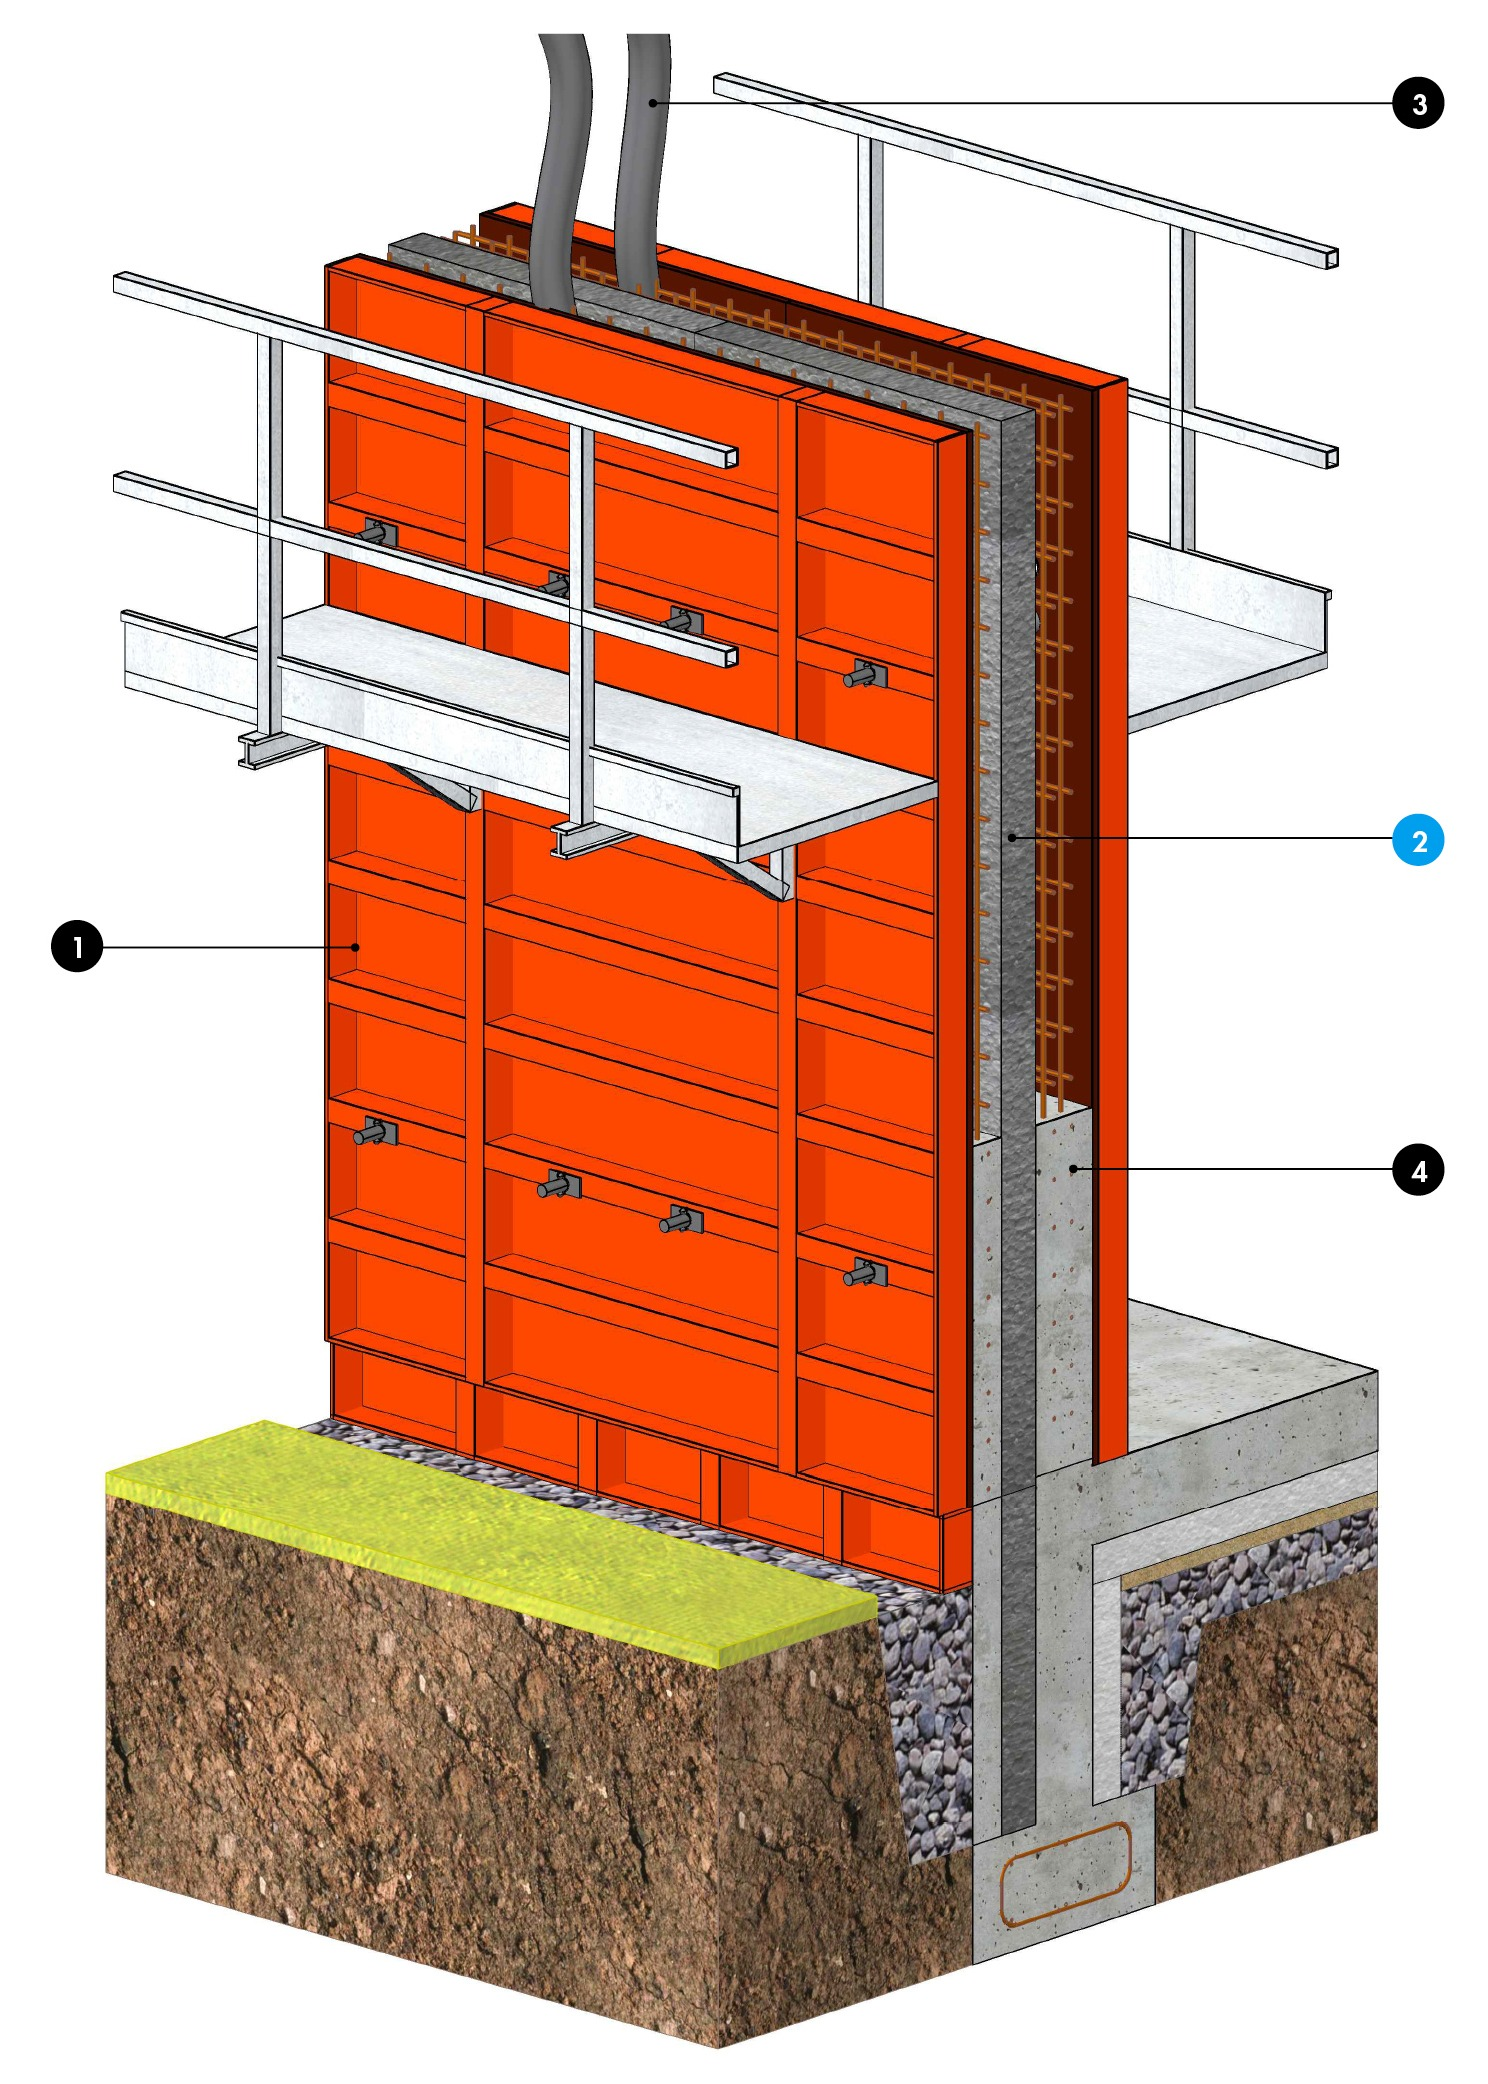 knauf thane mur b2i isolation int gr e dans les murs. Black Bedroom Furniture Sets. Home Design Ideas